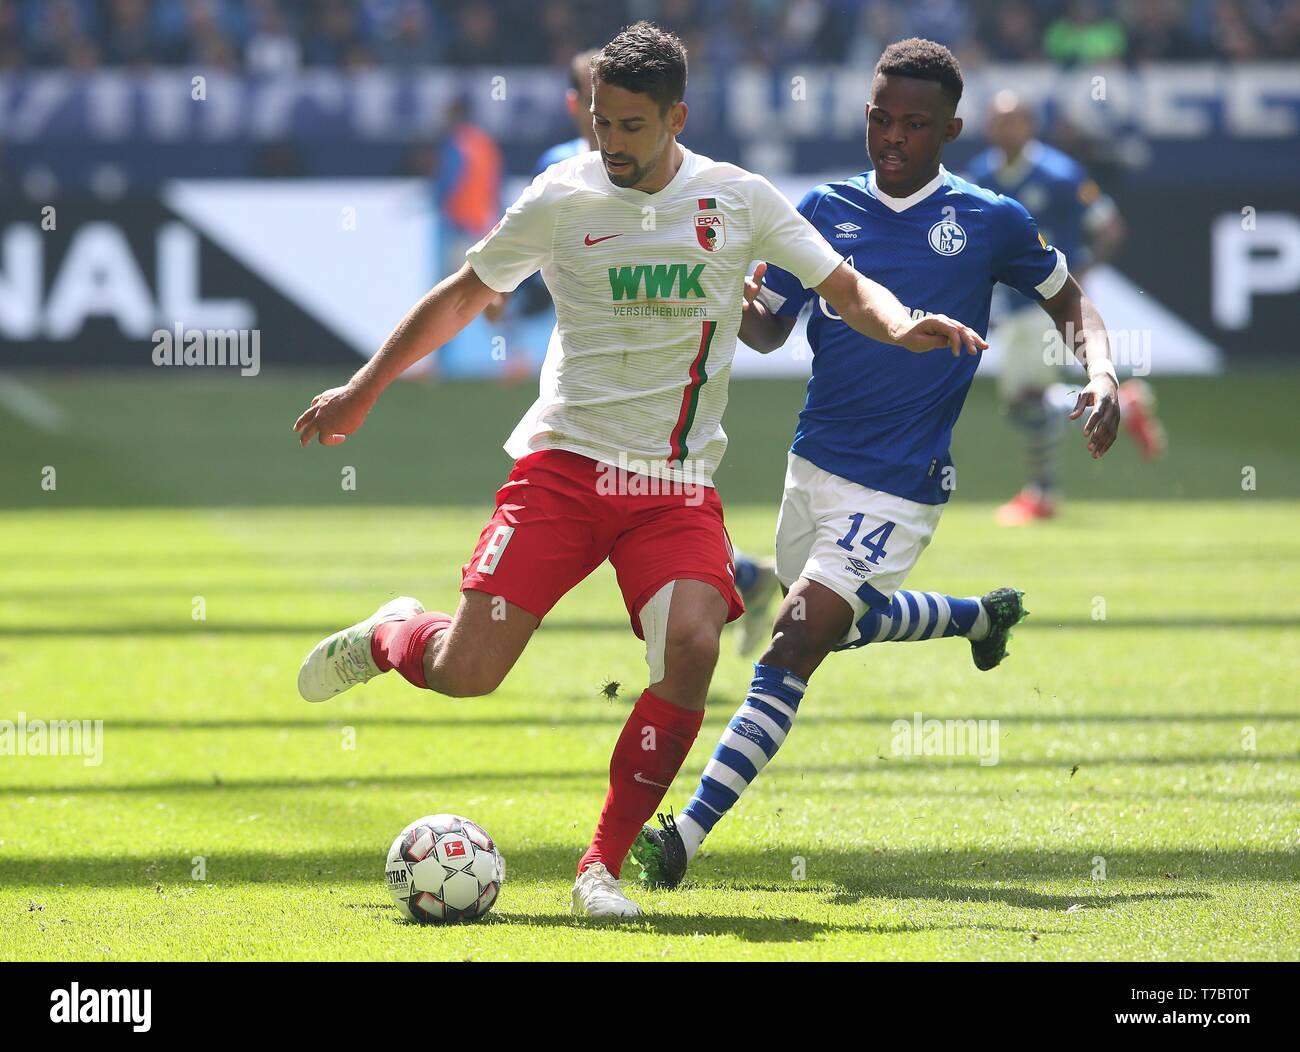 firo: 05.05.2019, Football, 2018/2019, 1.Bundesliga: FC Schalke 04 - FC Augsburg Rani Khedira, single action   usage worldwide - Stock Image